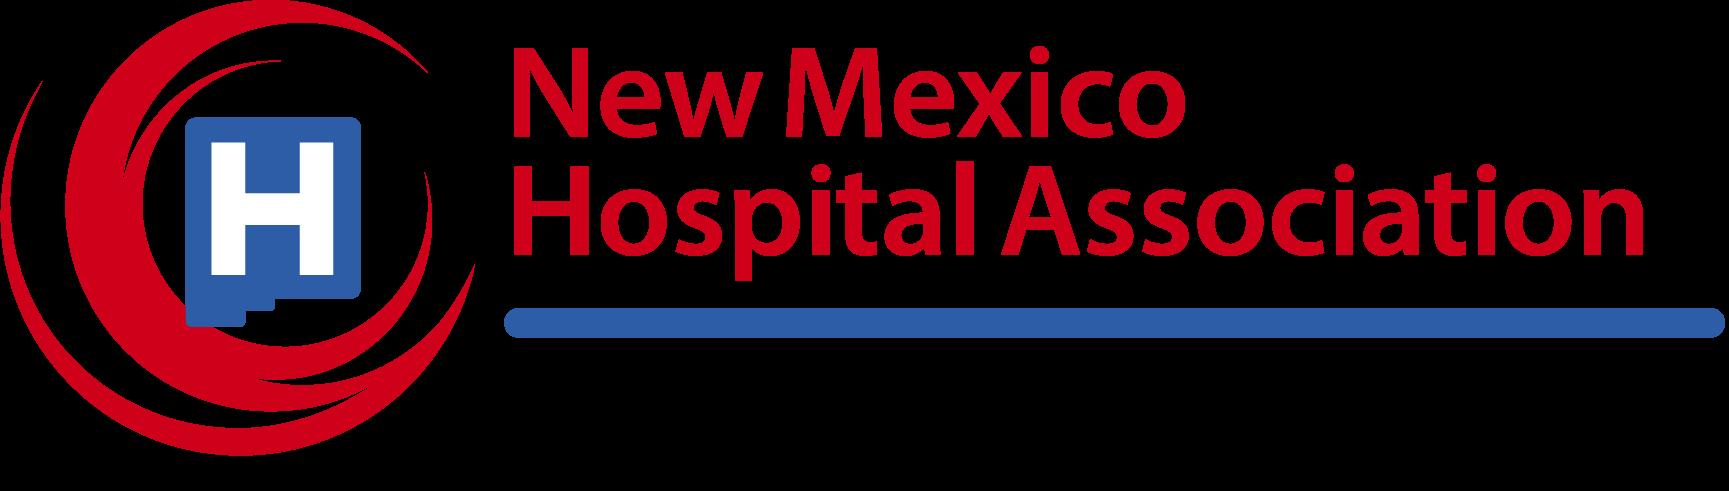 New Mexico Hospital Association